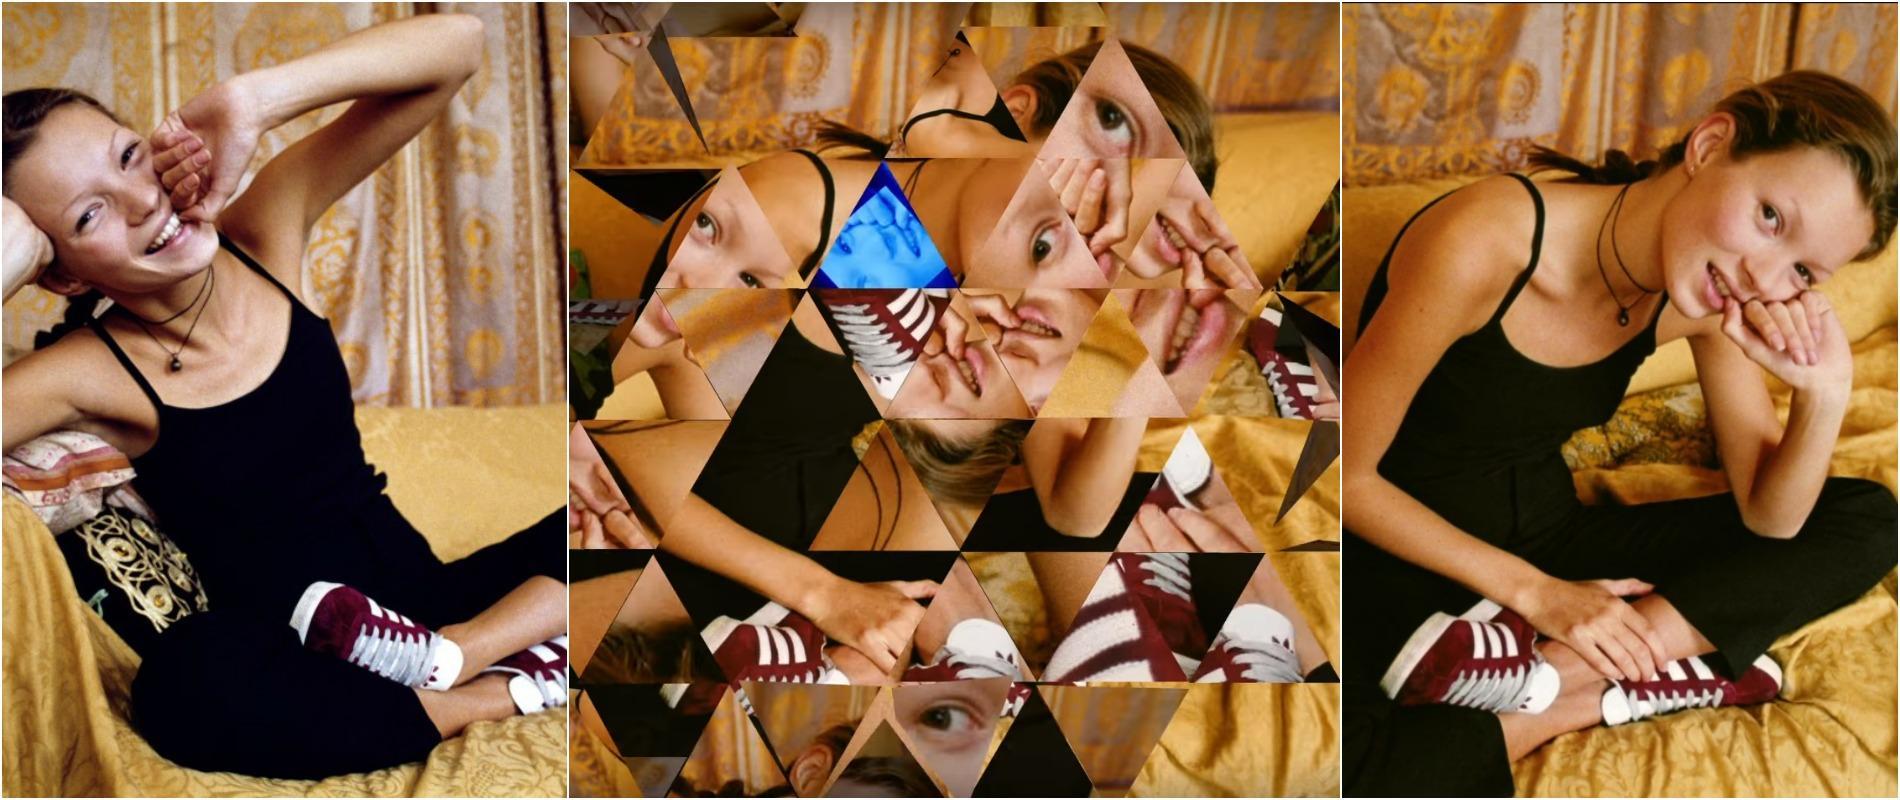 Adidas x Kate Moss x Doug Abraham, la collab' qui signe le